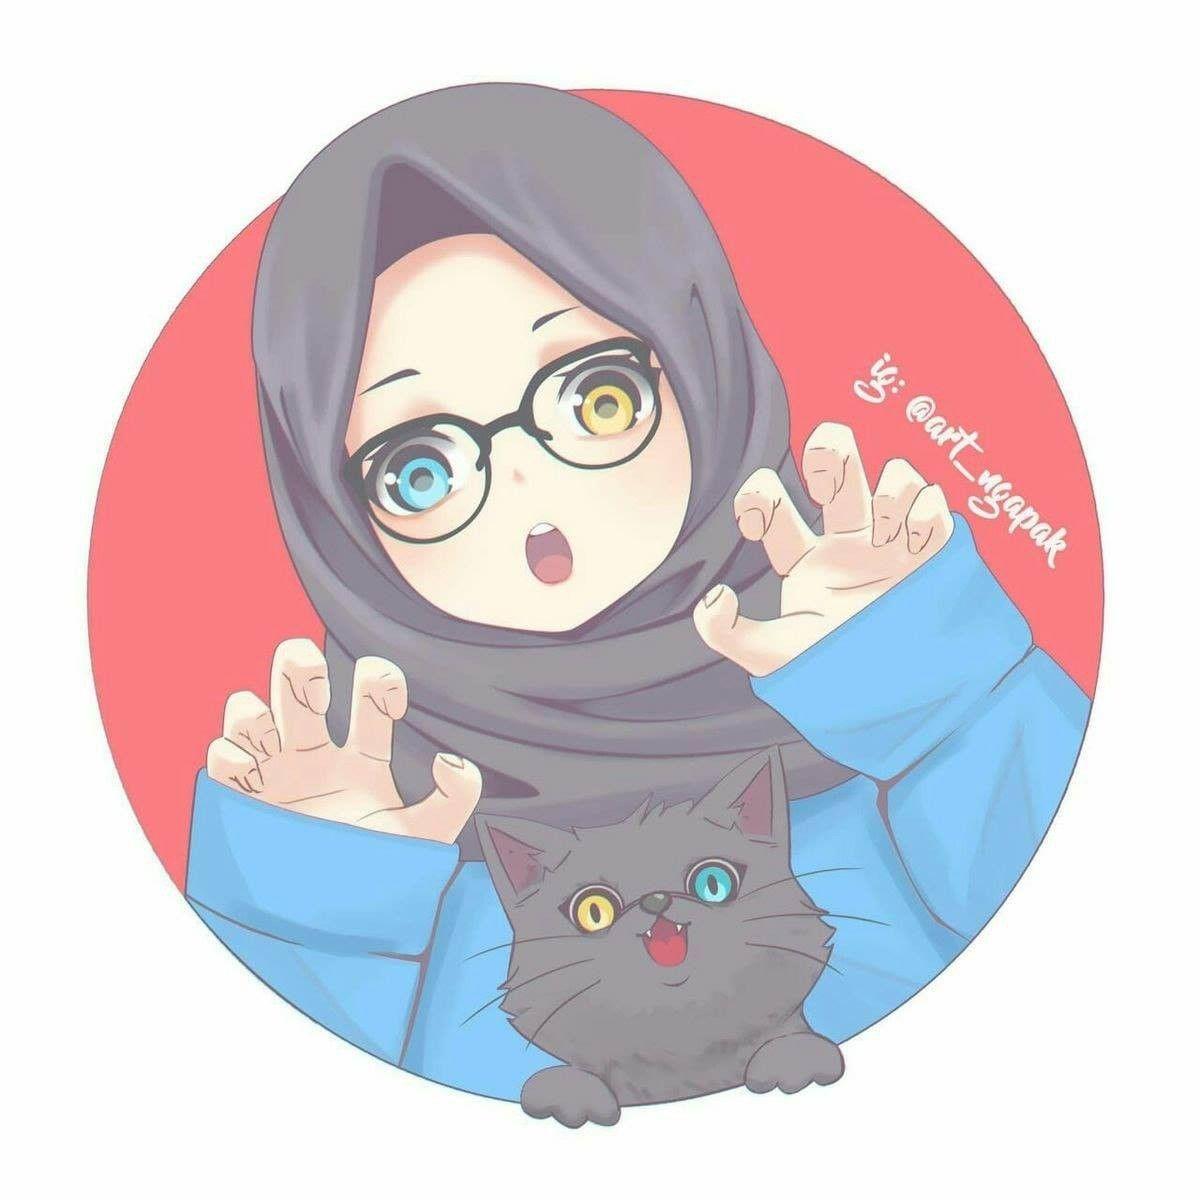 Sc Hijab Girls Photo Https Mobile Facebook Com Hijab Girls Photo 863221723819110 Refid 52 Tn C R Anime Muslim Anime Muslimah Islamic Cartoon